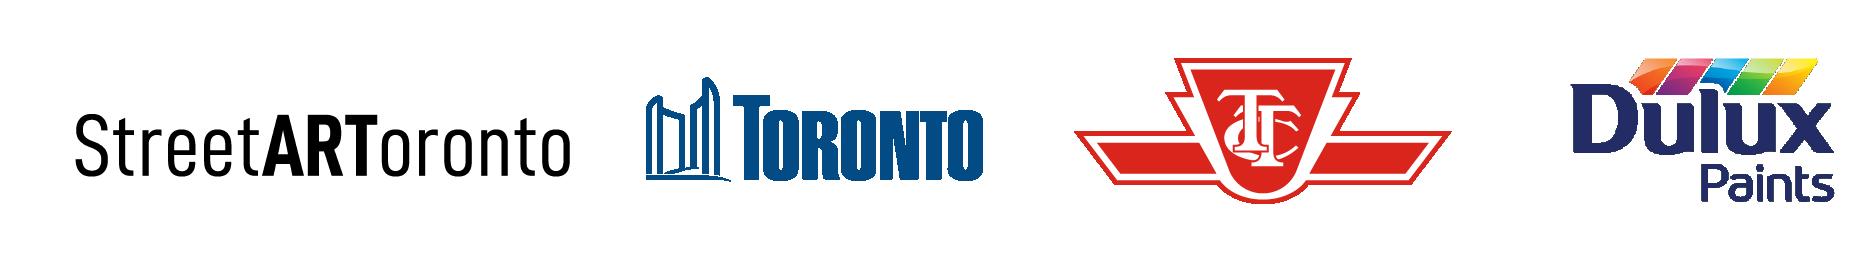 StreetARToronto logo, City of Toronto logo, Dulux Paint LogoTTC logo,